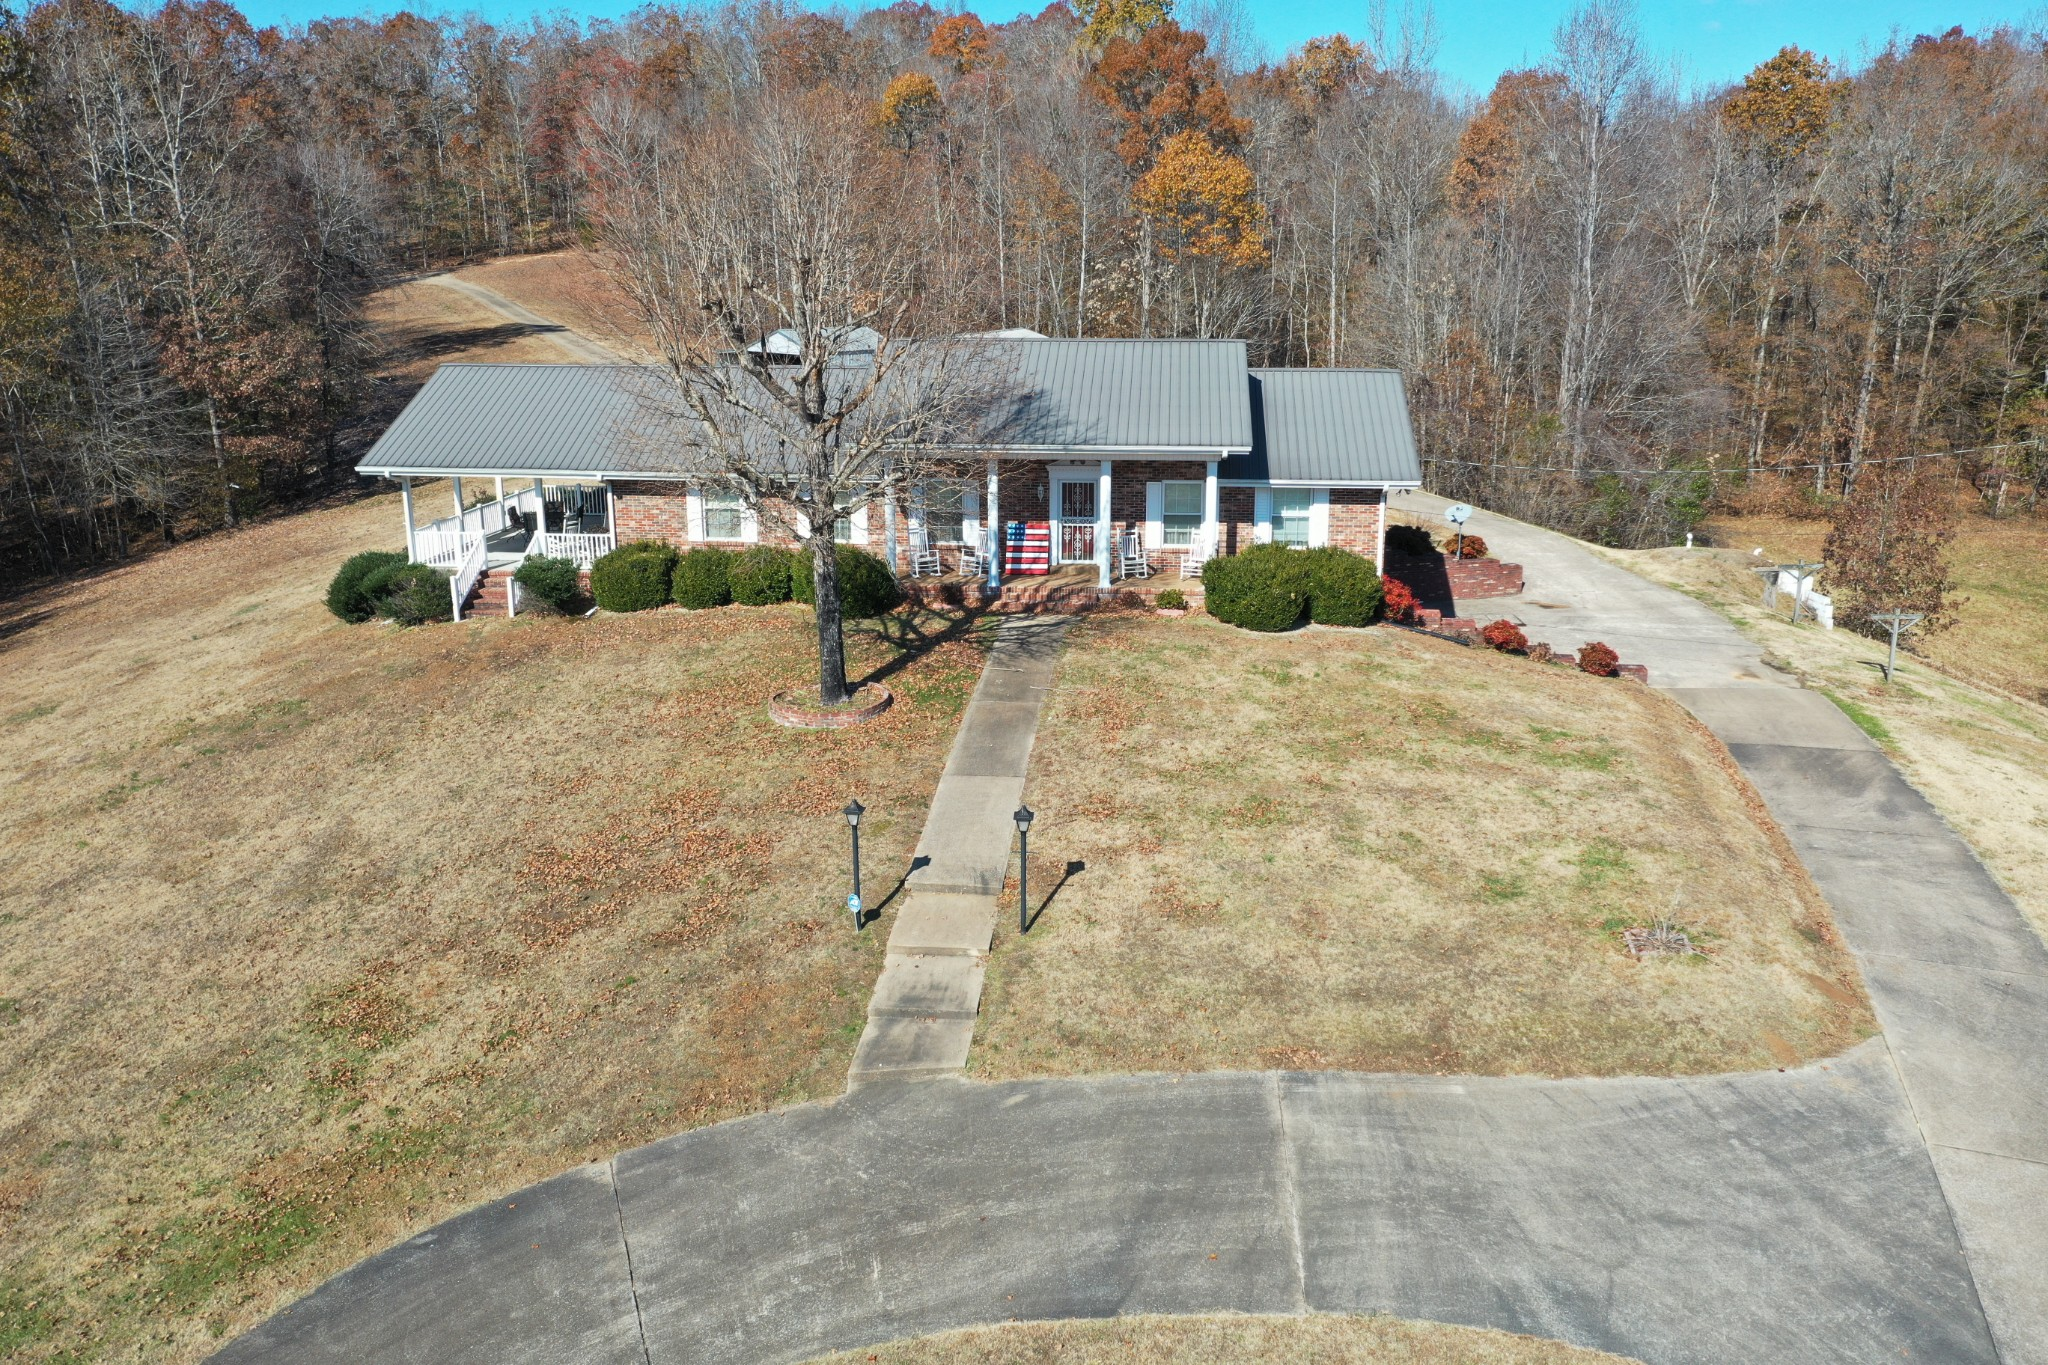 244 Depriest Saw Mill Rd, Linden, TN 37096 - Linden, TN real estate listing